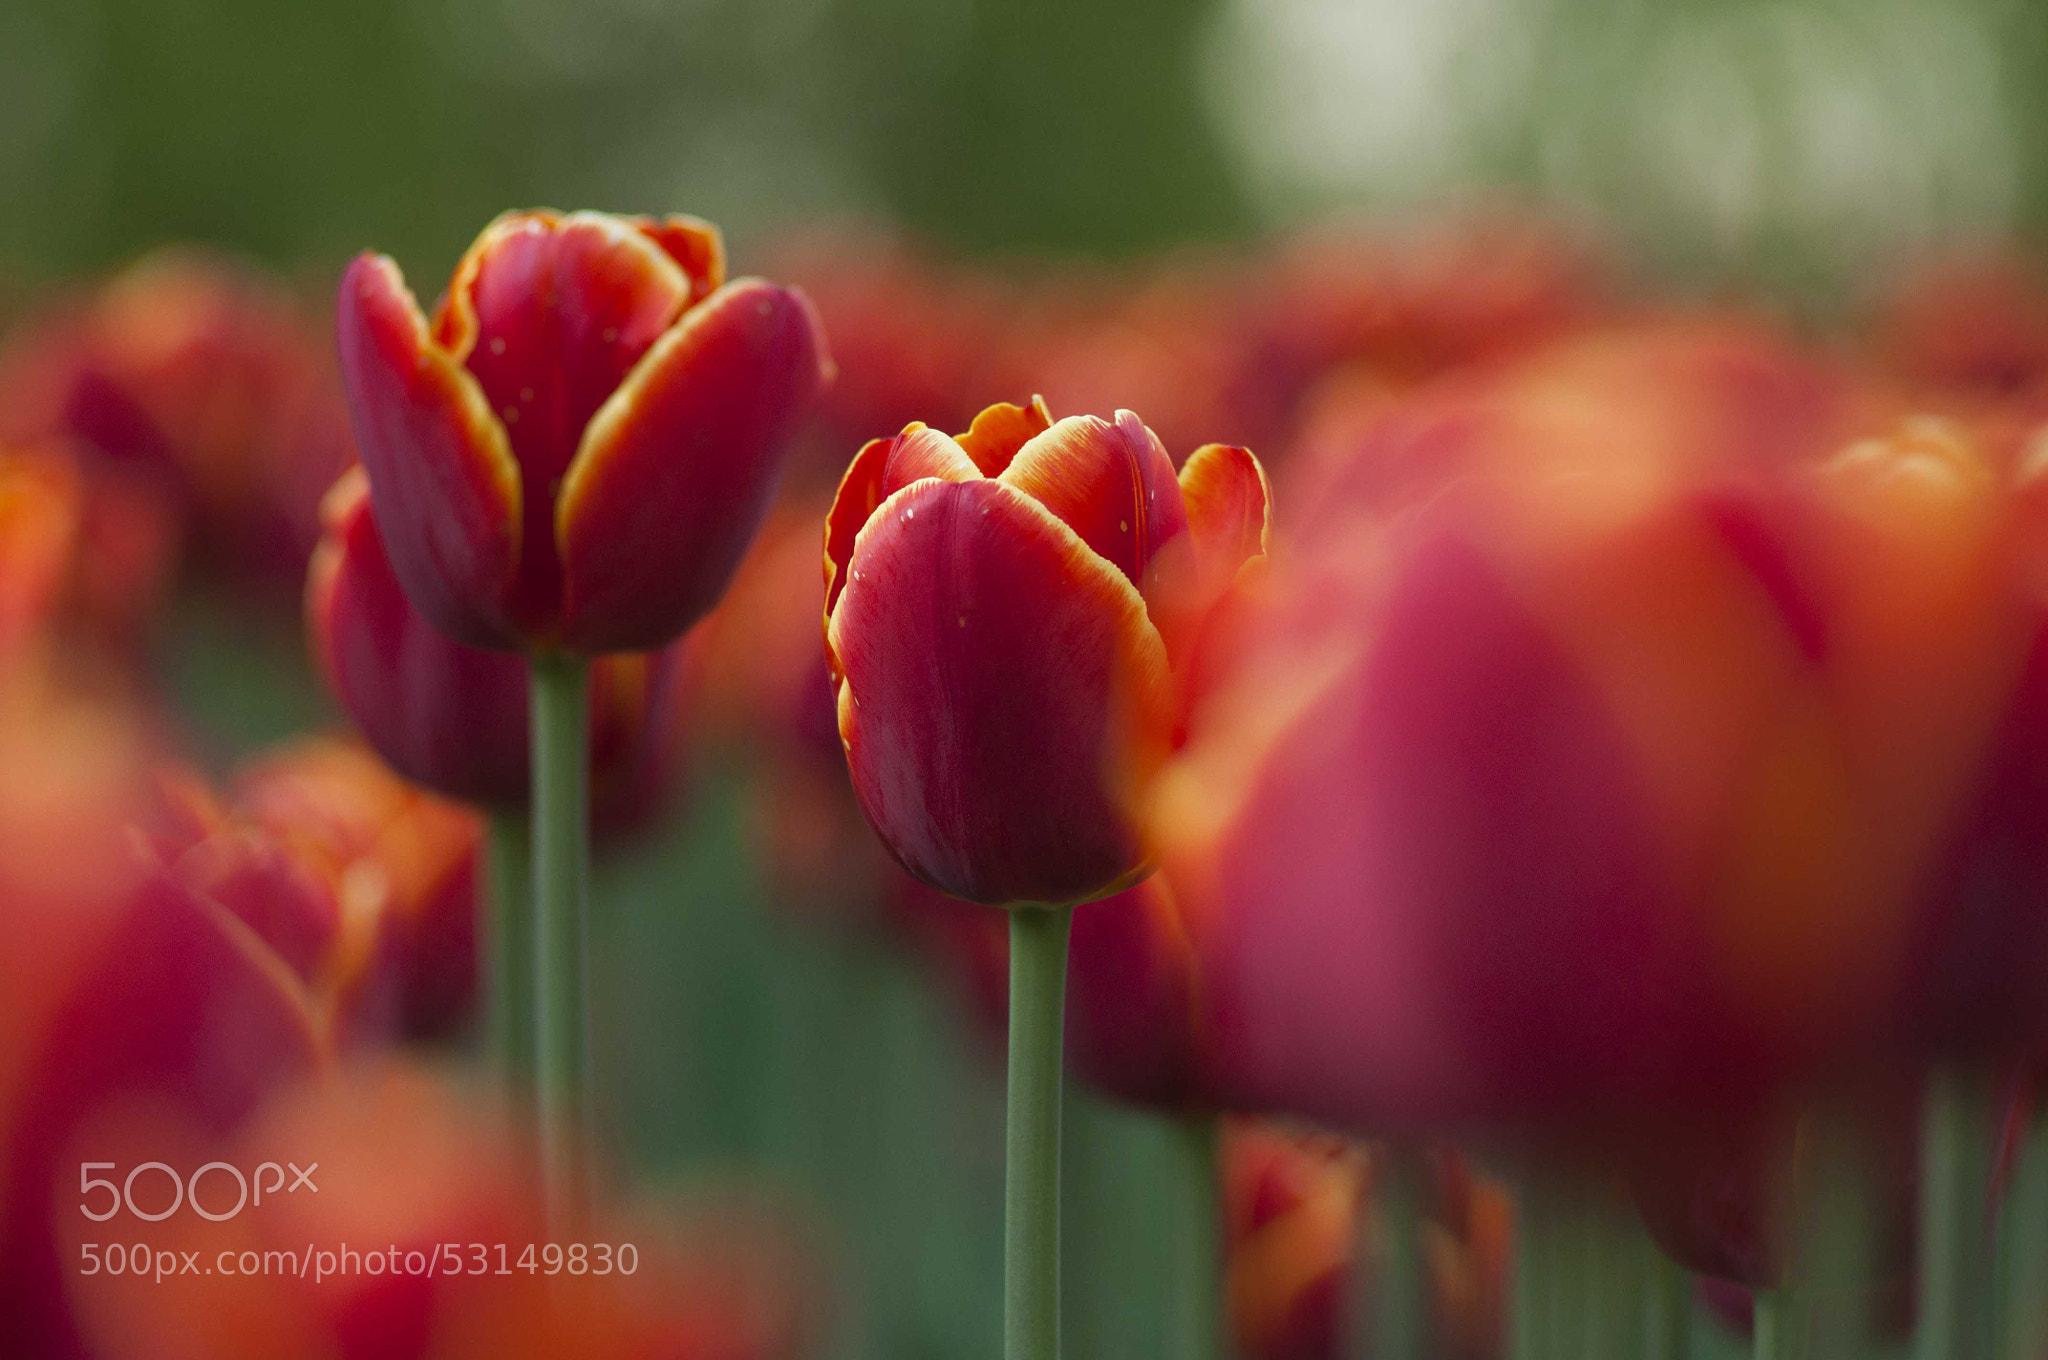 Photograph Tulip's breath by Sasha Pleshko on 500px